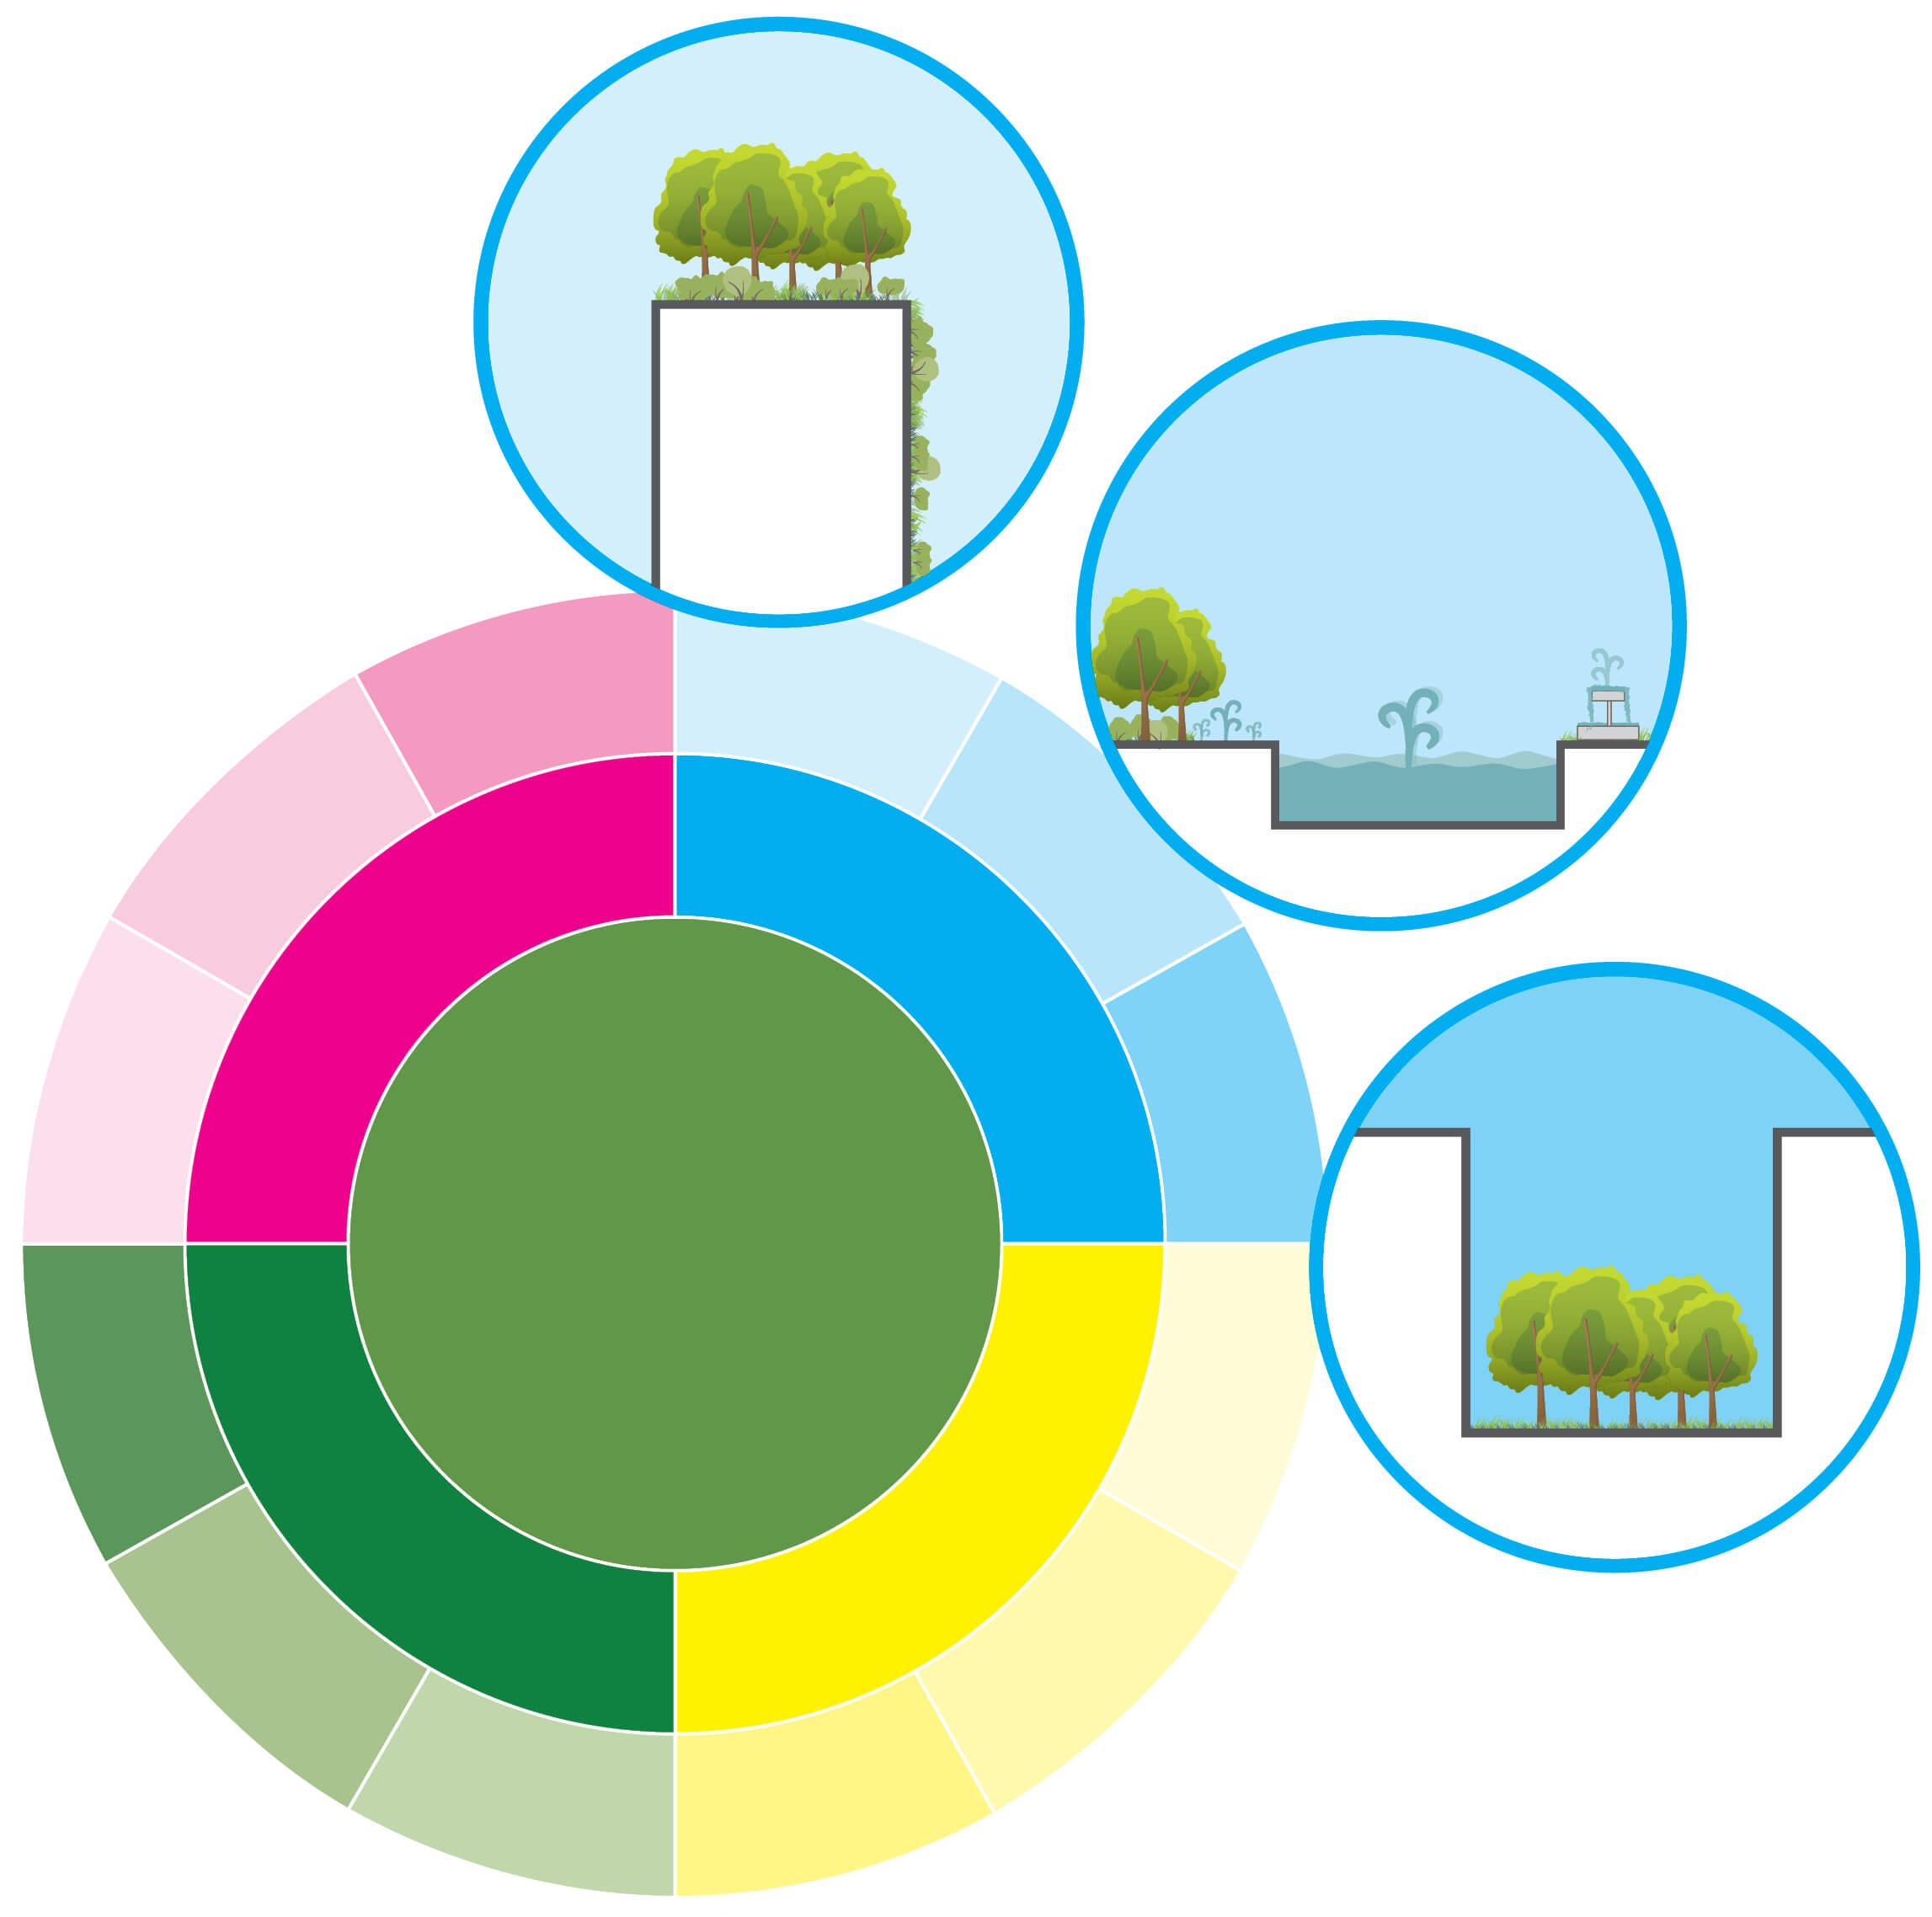 felixx-greenicons-conceptdiagram2.jpg